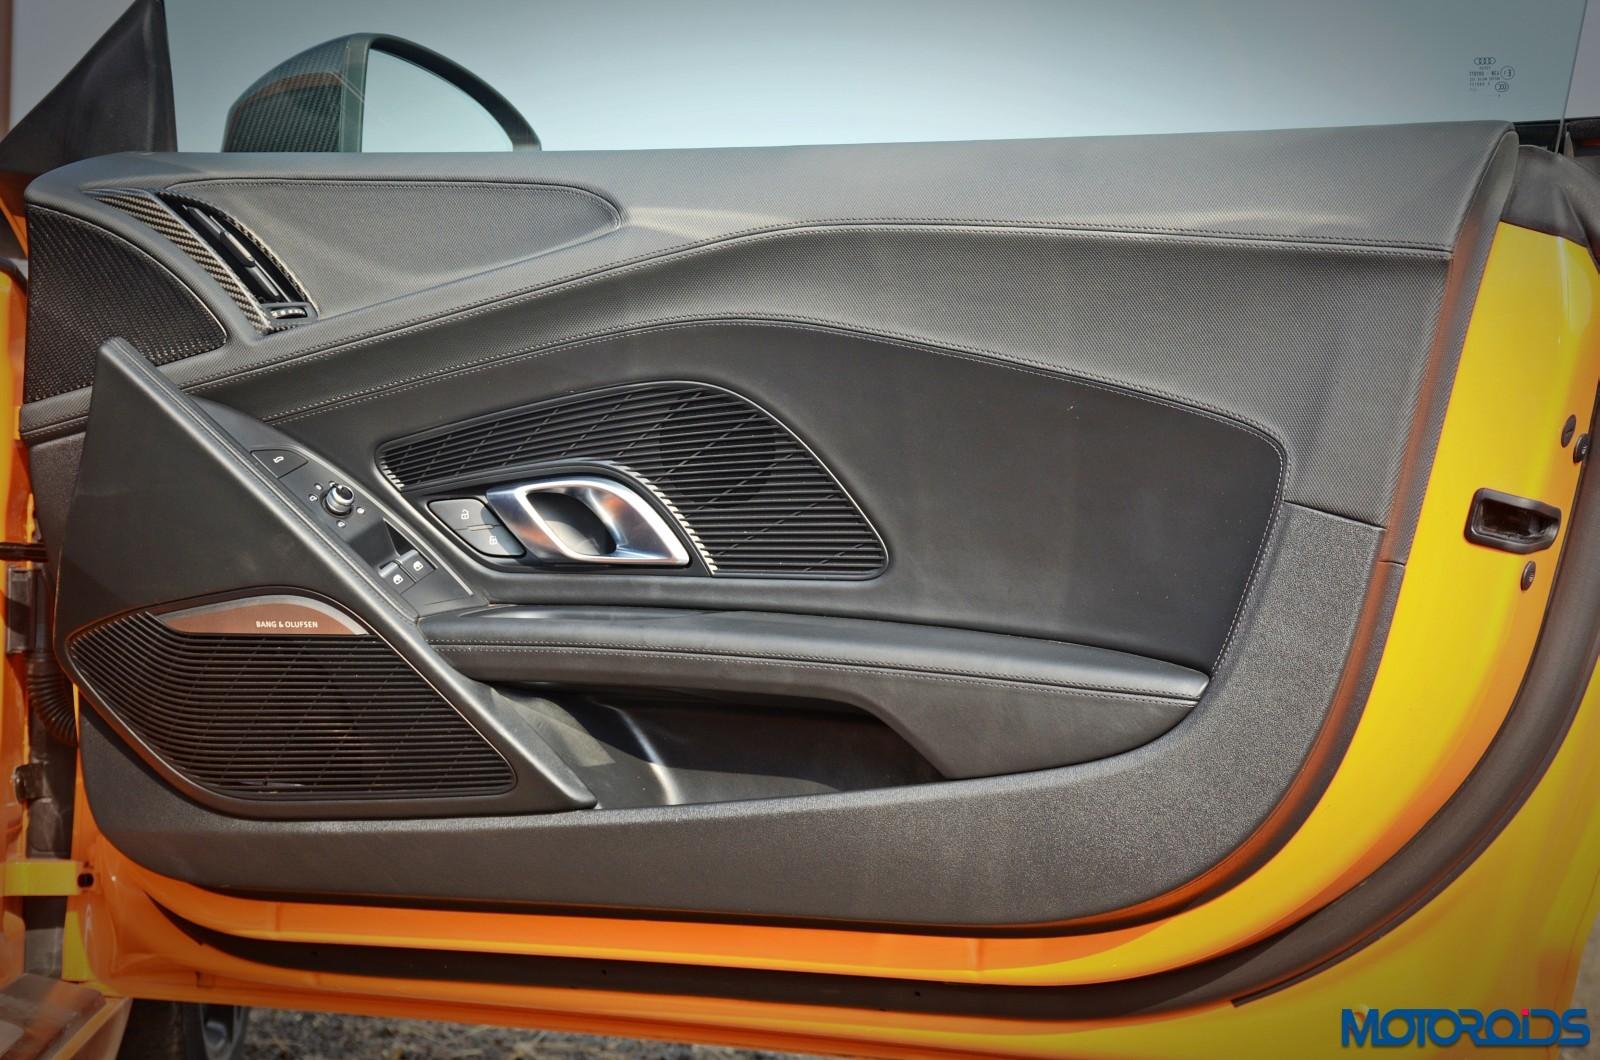 New-Audi-R8-V10-Plus-doors-2